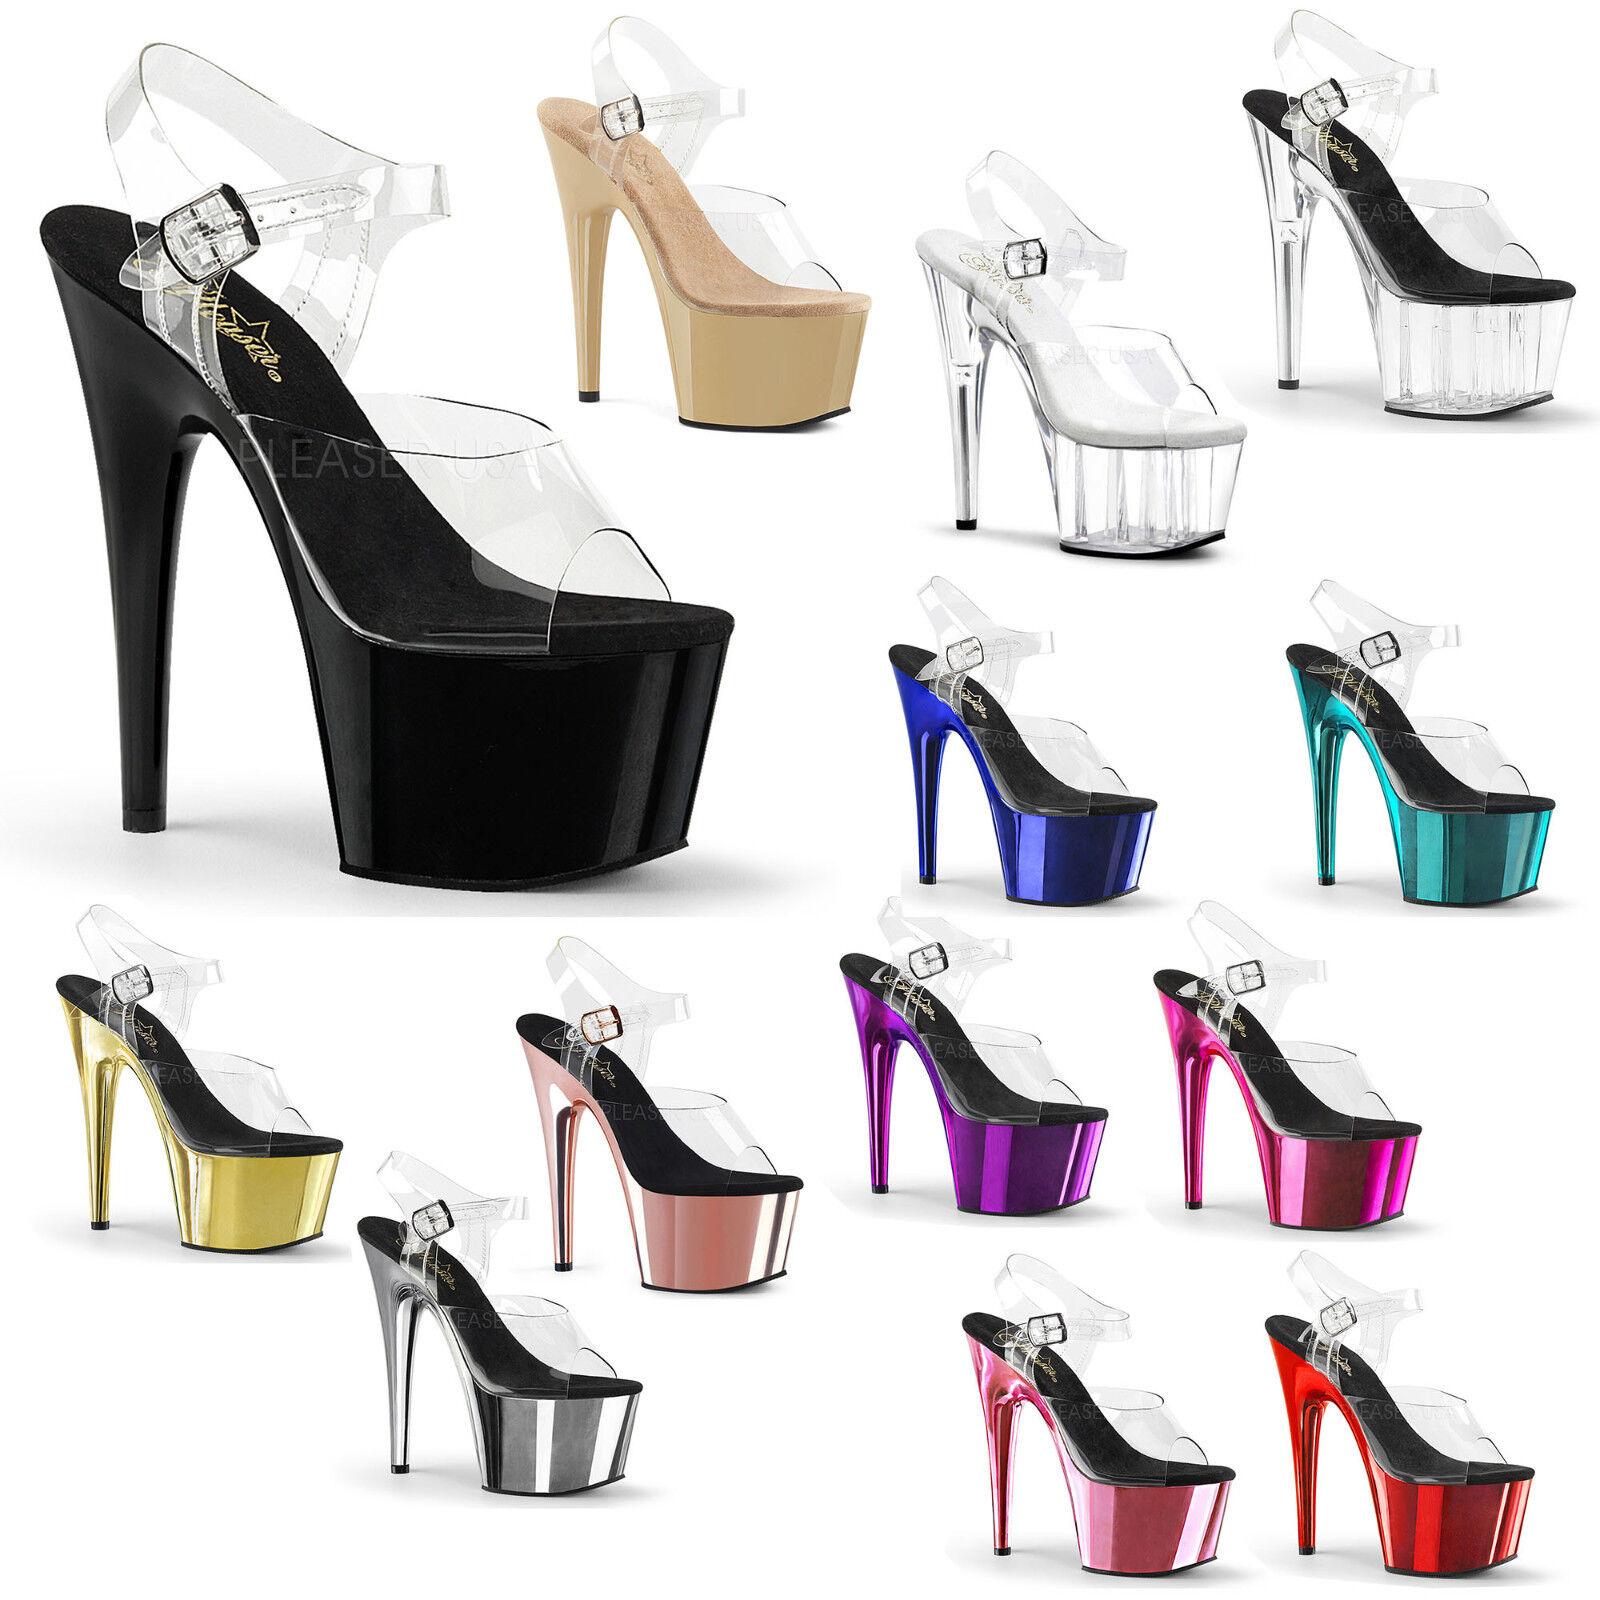 PLEASER - Adore-708 Stiletto Heel Ankle Strap Platform Sandal schuhe